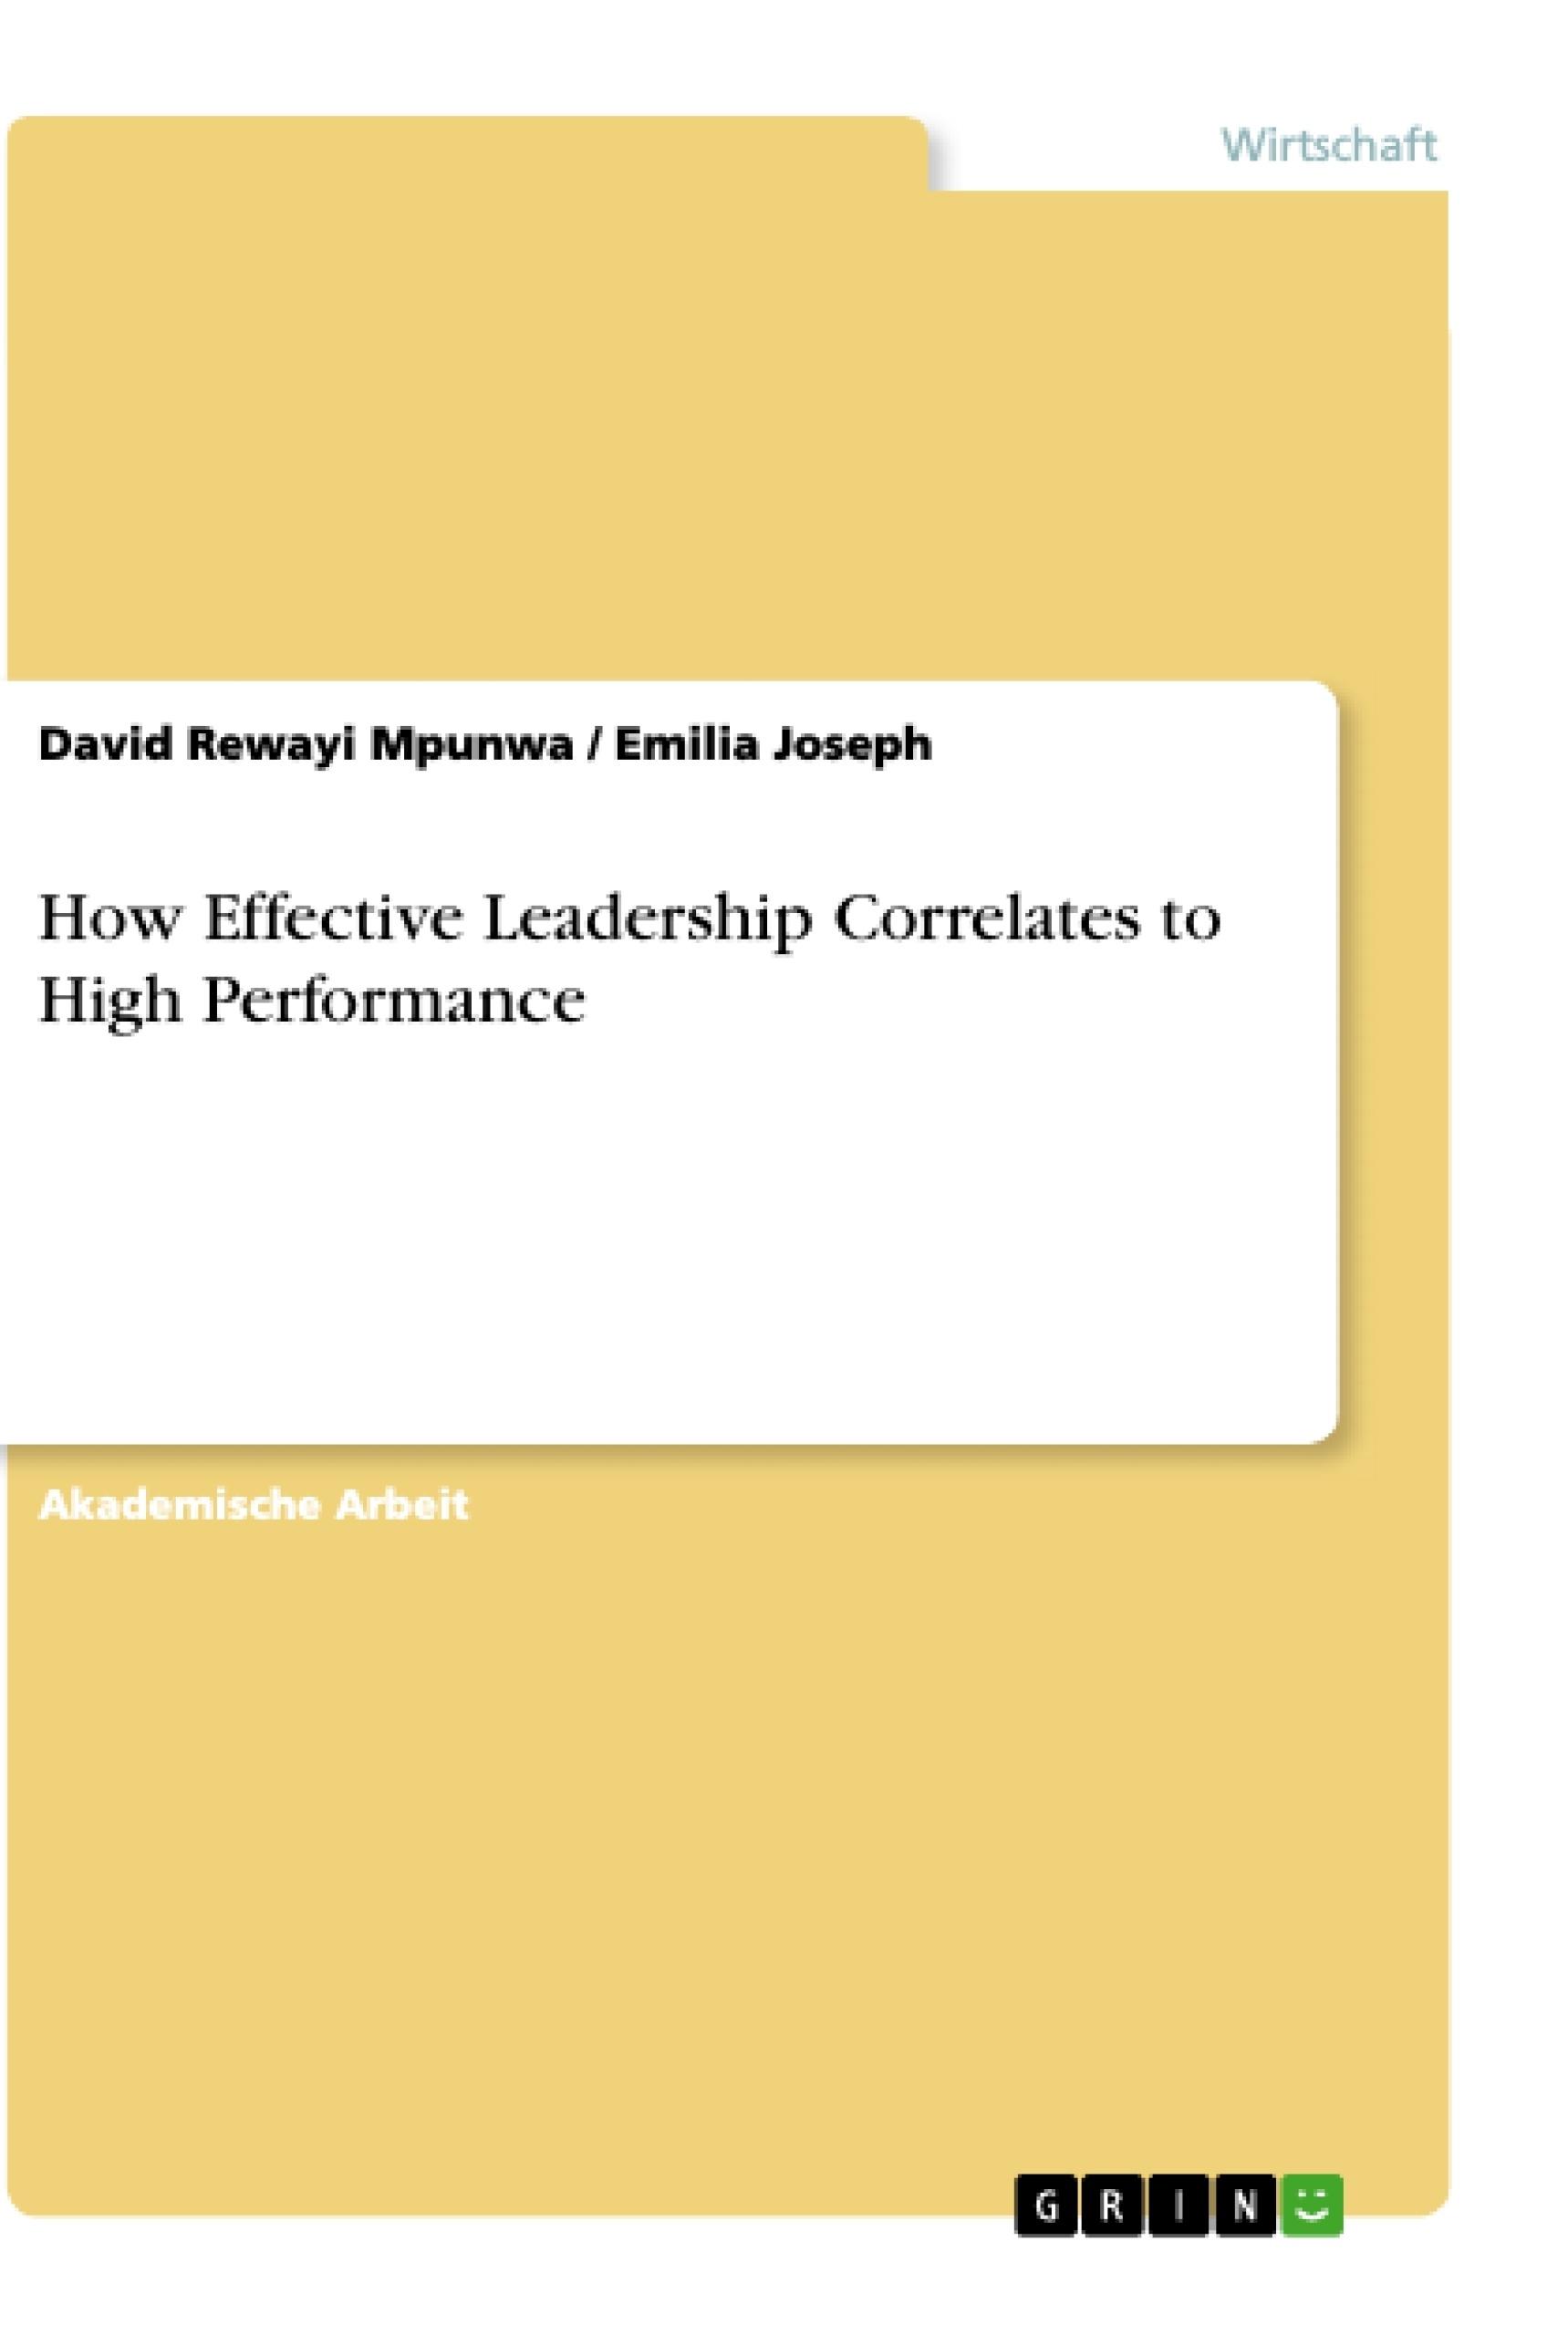 Titel: How Effective Leadership Correlates to High Performance